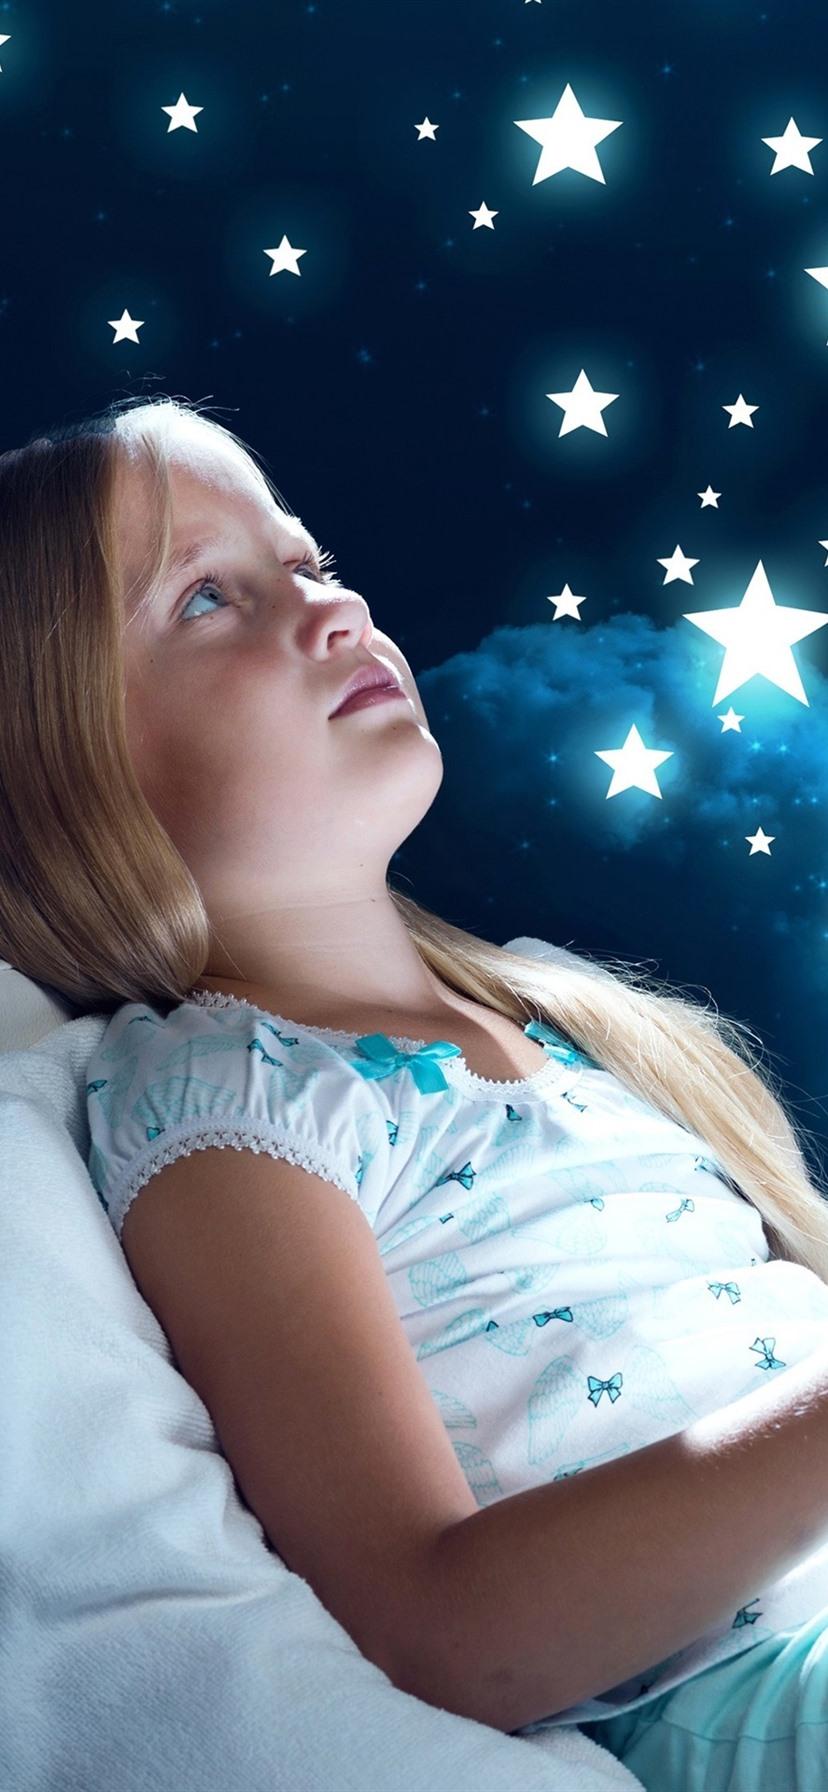 Cute Little Girl Child Imagination Stars Moon Clouds